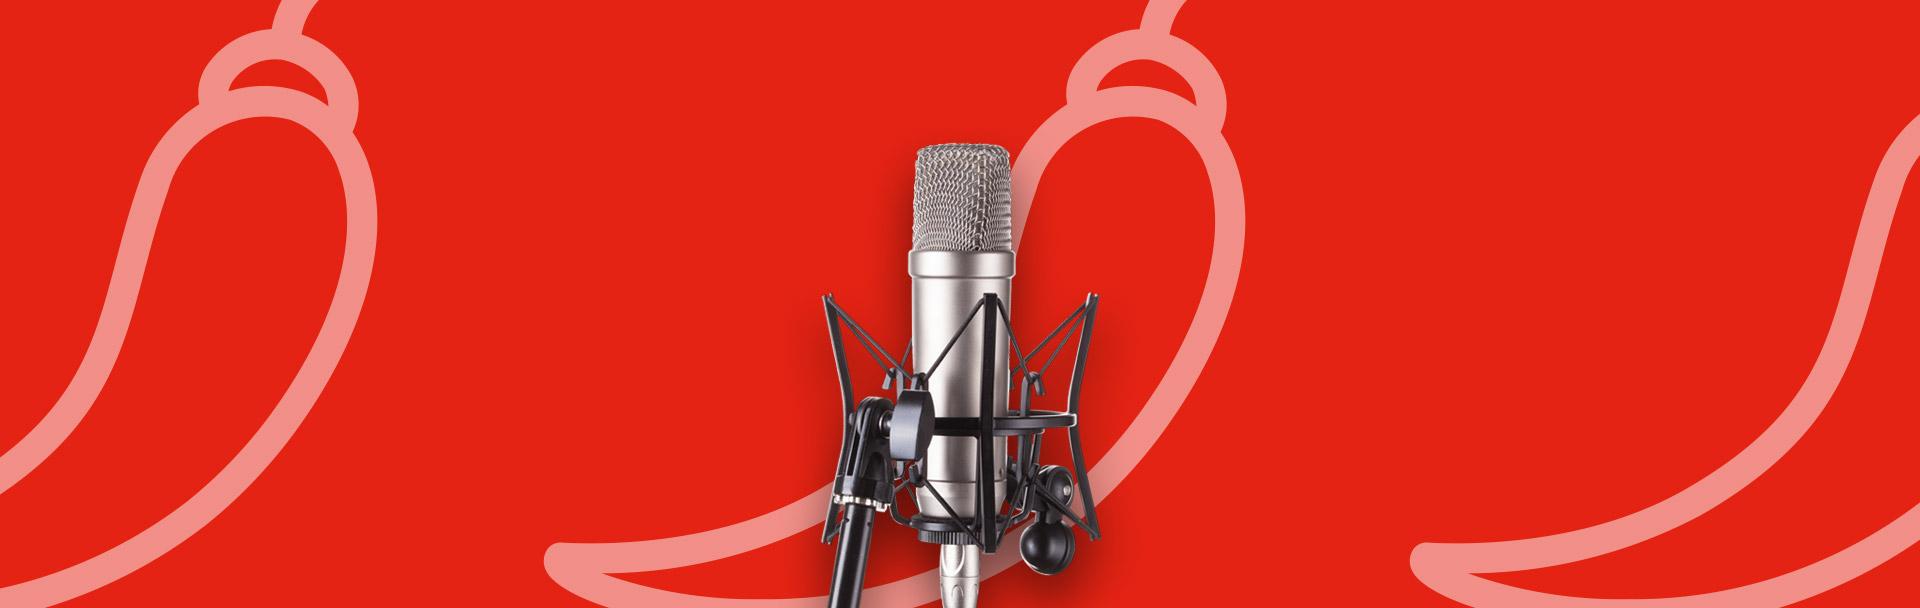 Podcast: Het Factbased Improvement gedachtegoed - Future Facts